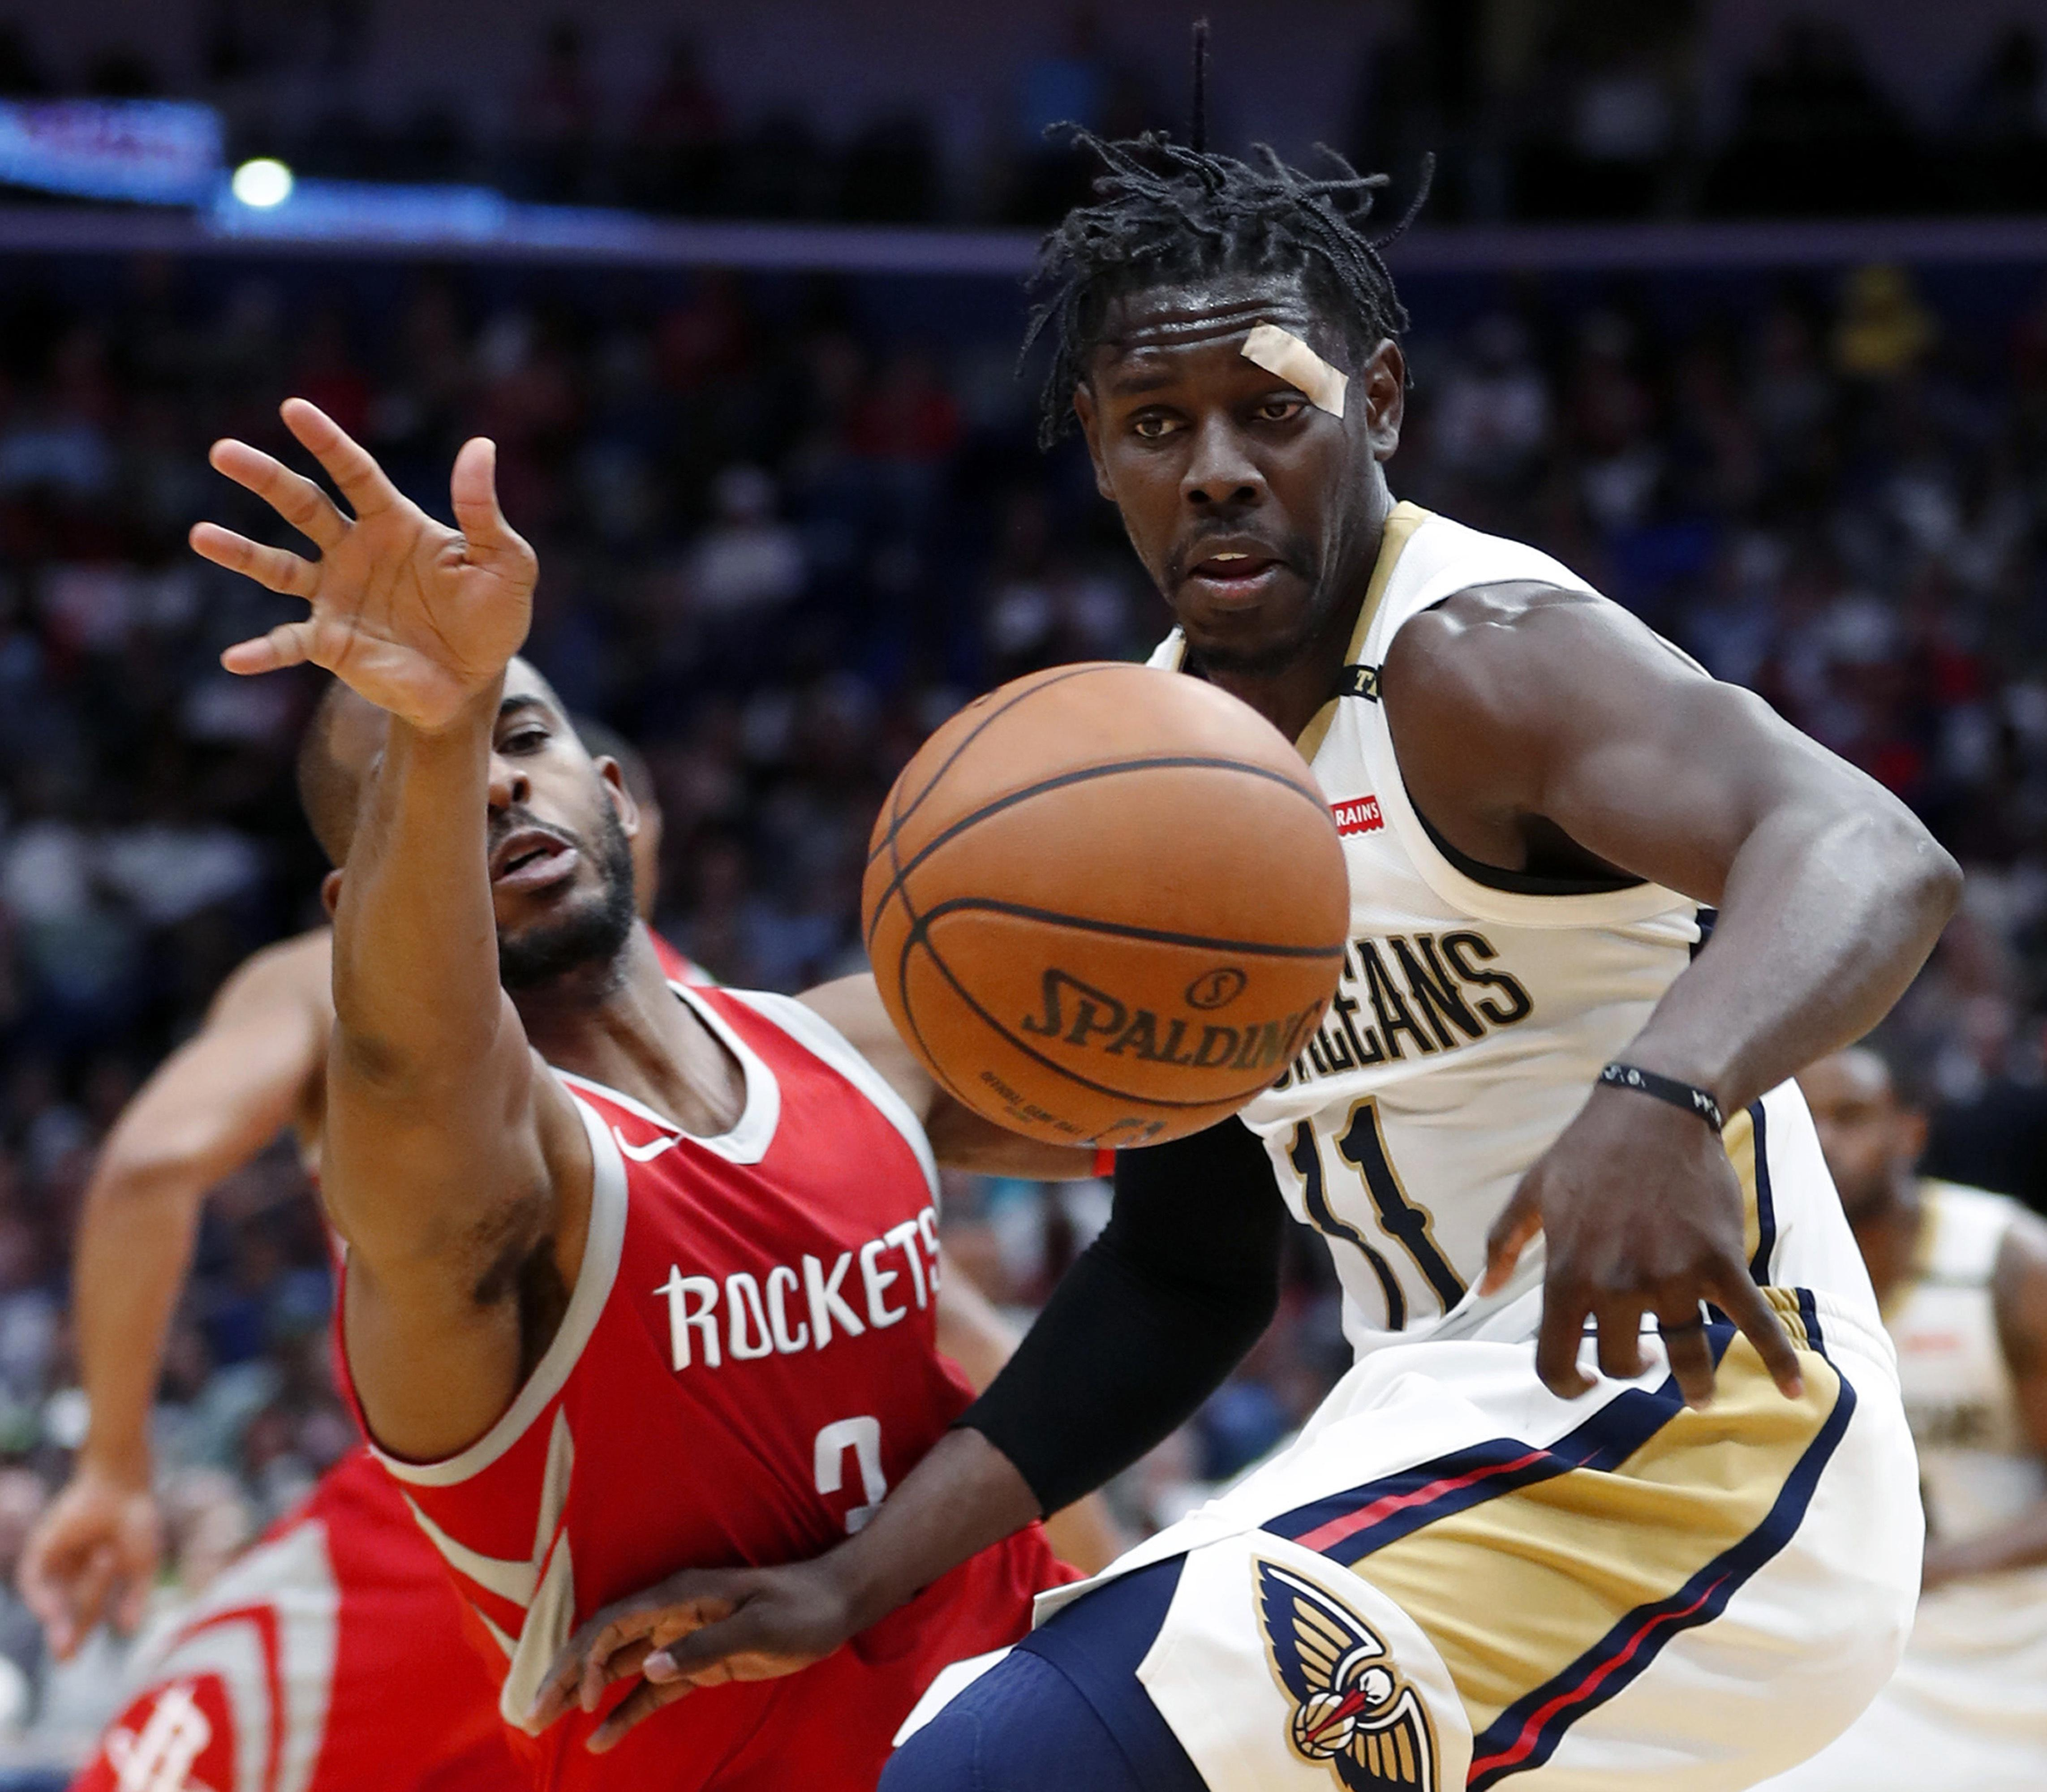 Rockets_pelicans_basketball_73271